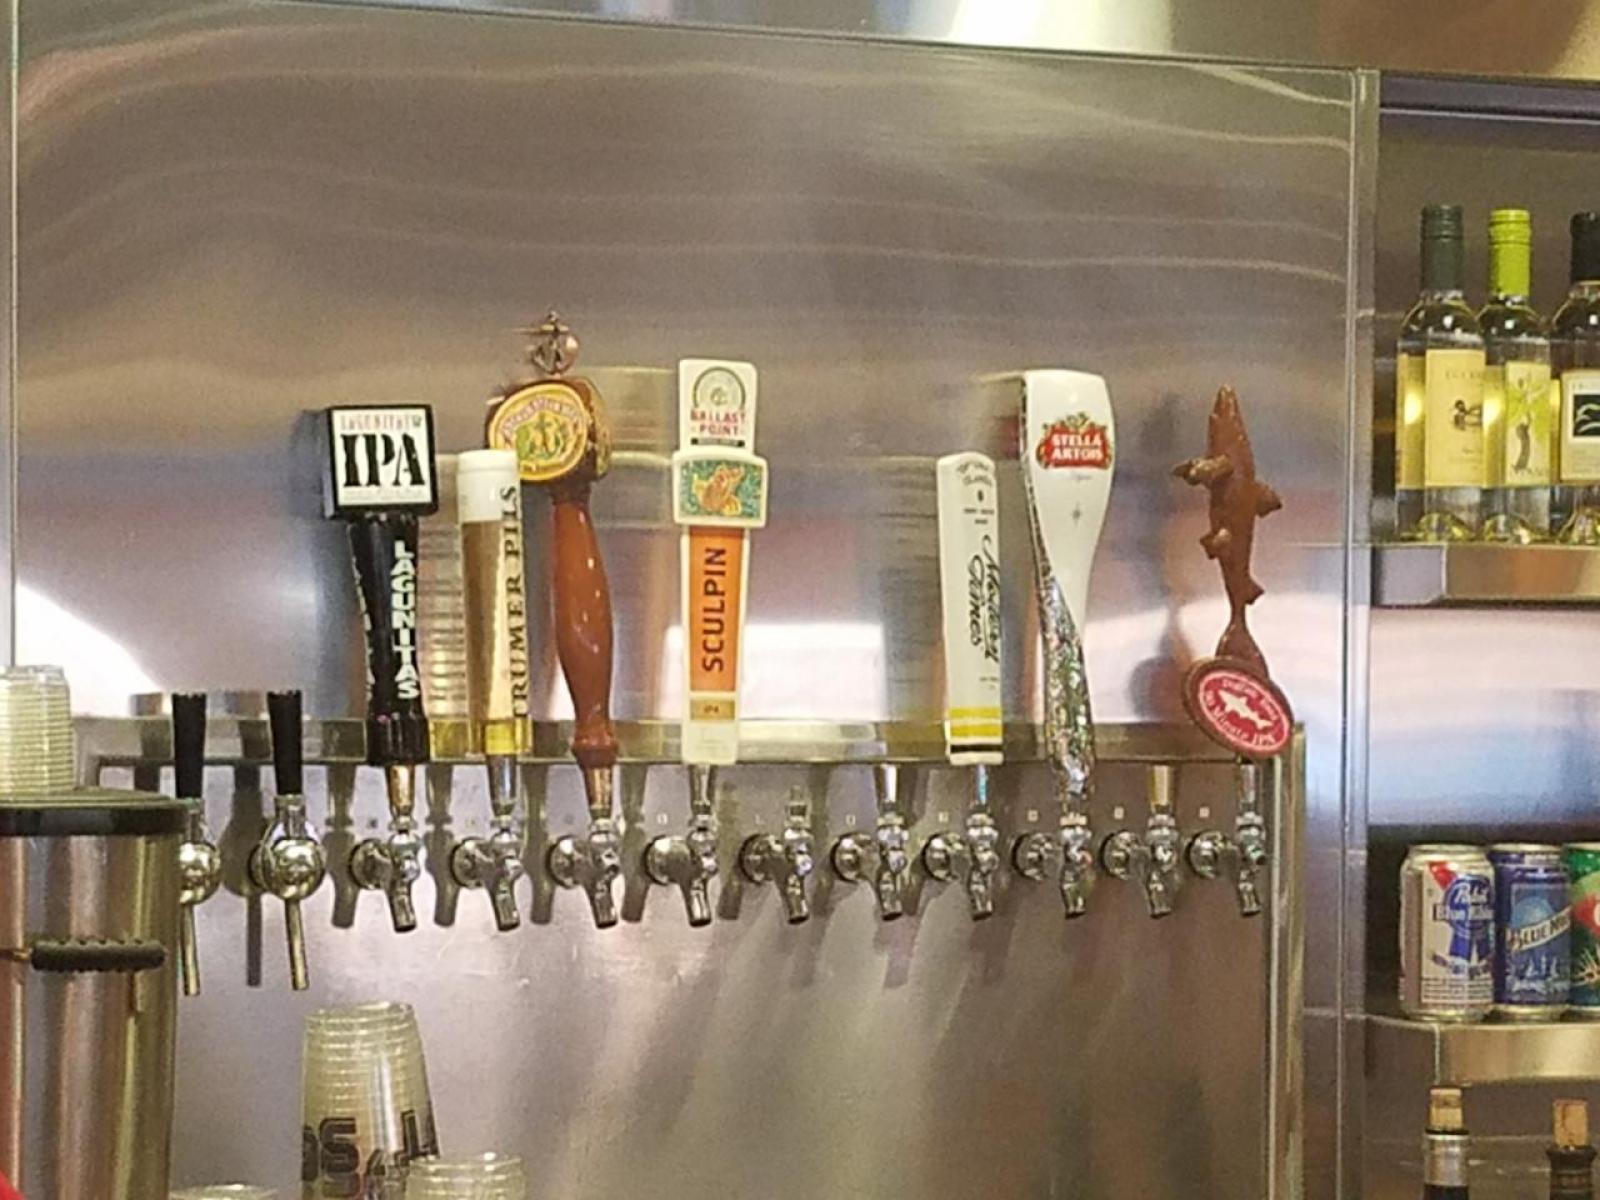 Half the taps